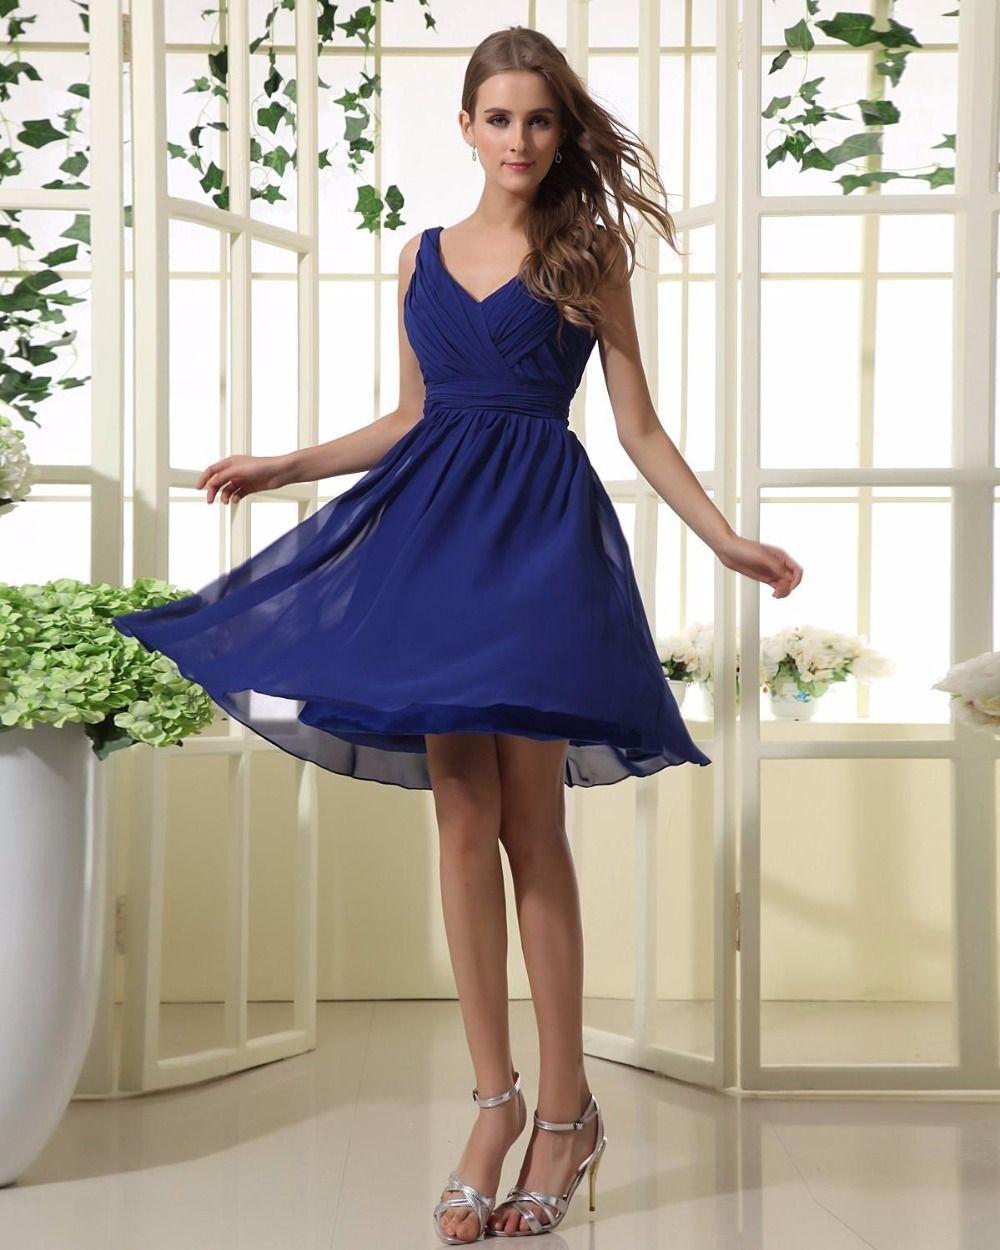 Httpsgooglesearchqdraped blue dress dresses ruffles knee length sleeveless v neck royal blue zipper bridesmaid dresses by okdress south africa ombrellifo Images